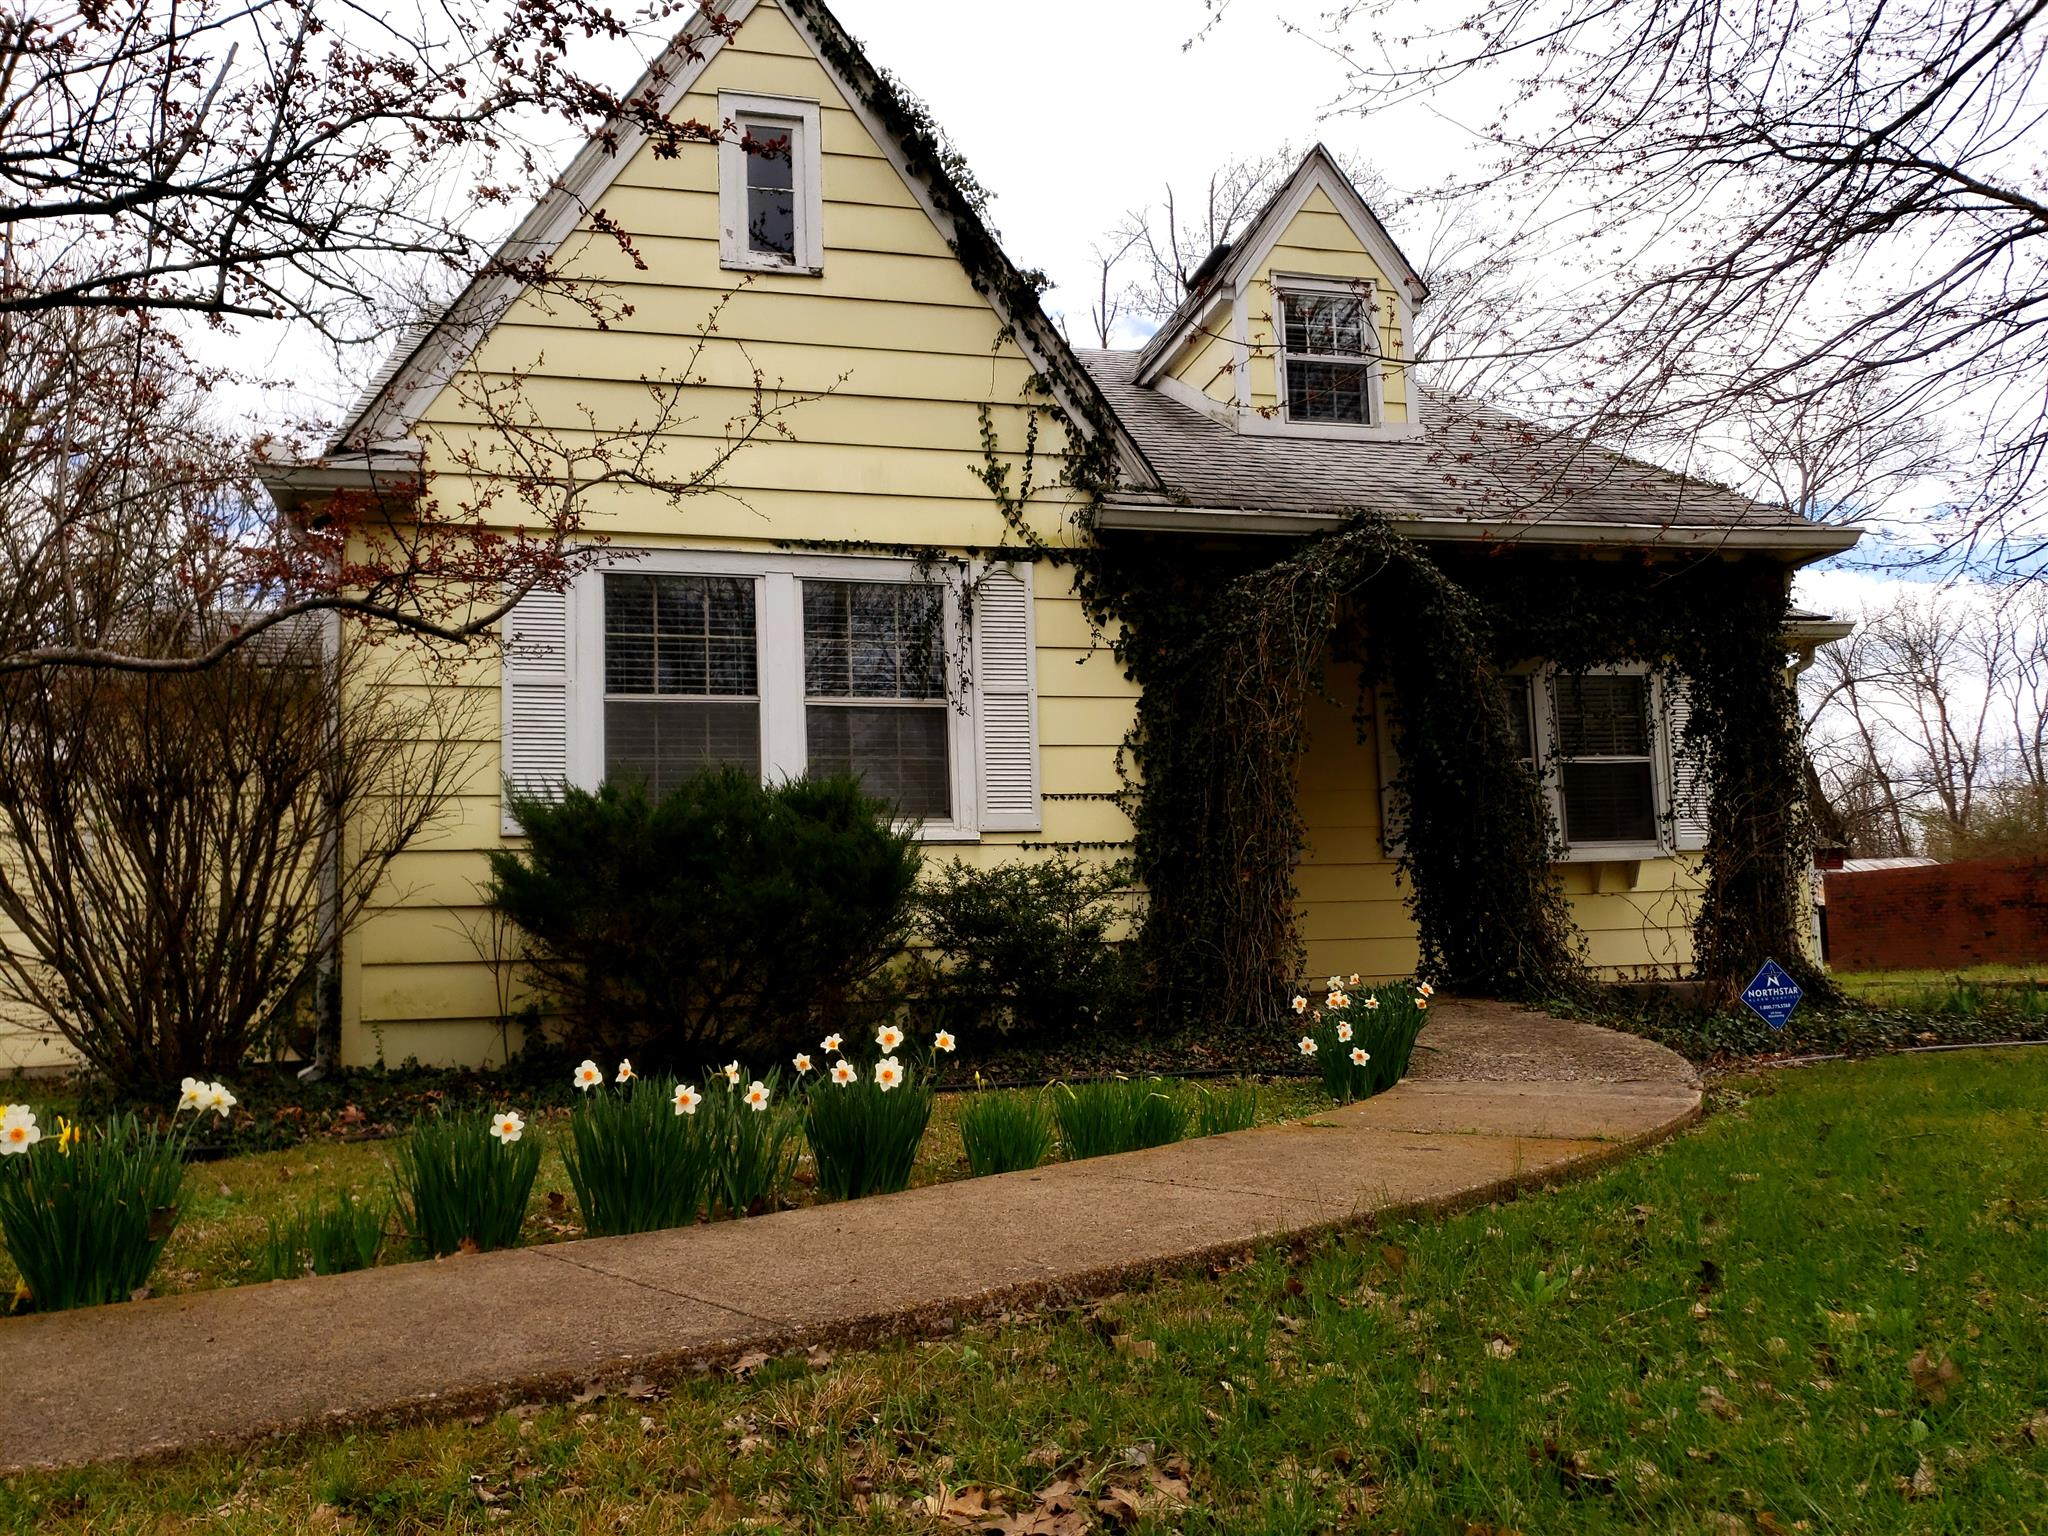 213 Pennsylvania Ave, Lebanon, TN 37087 - Lebanon, TN real estate listing